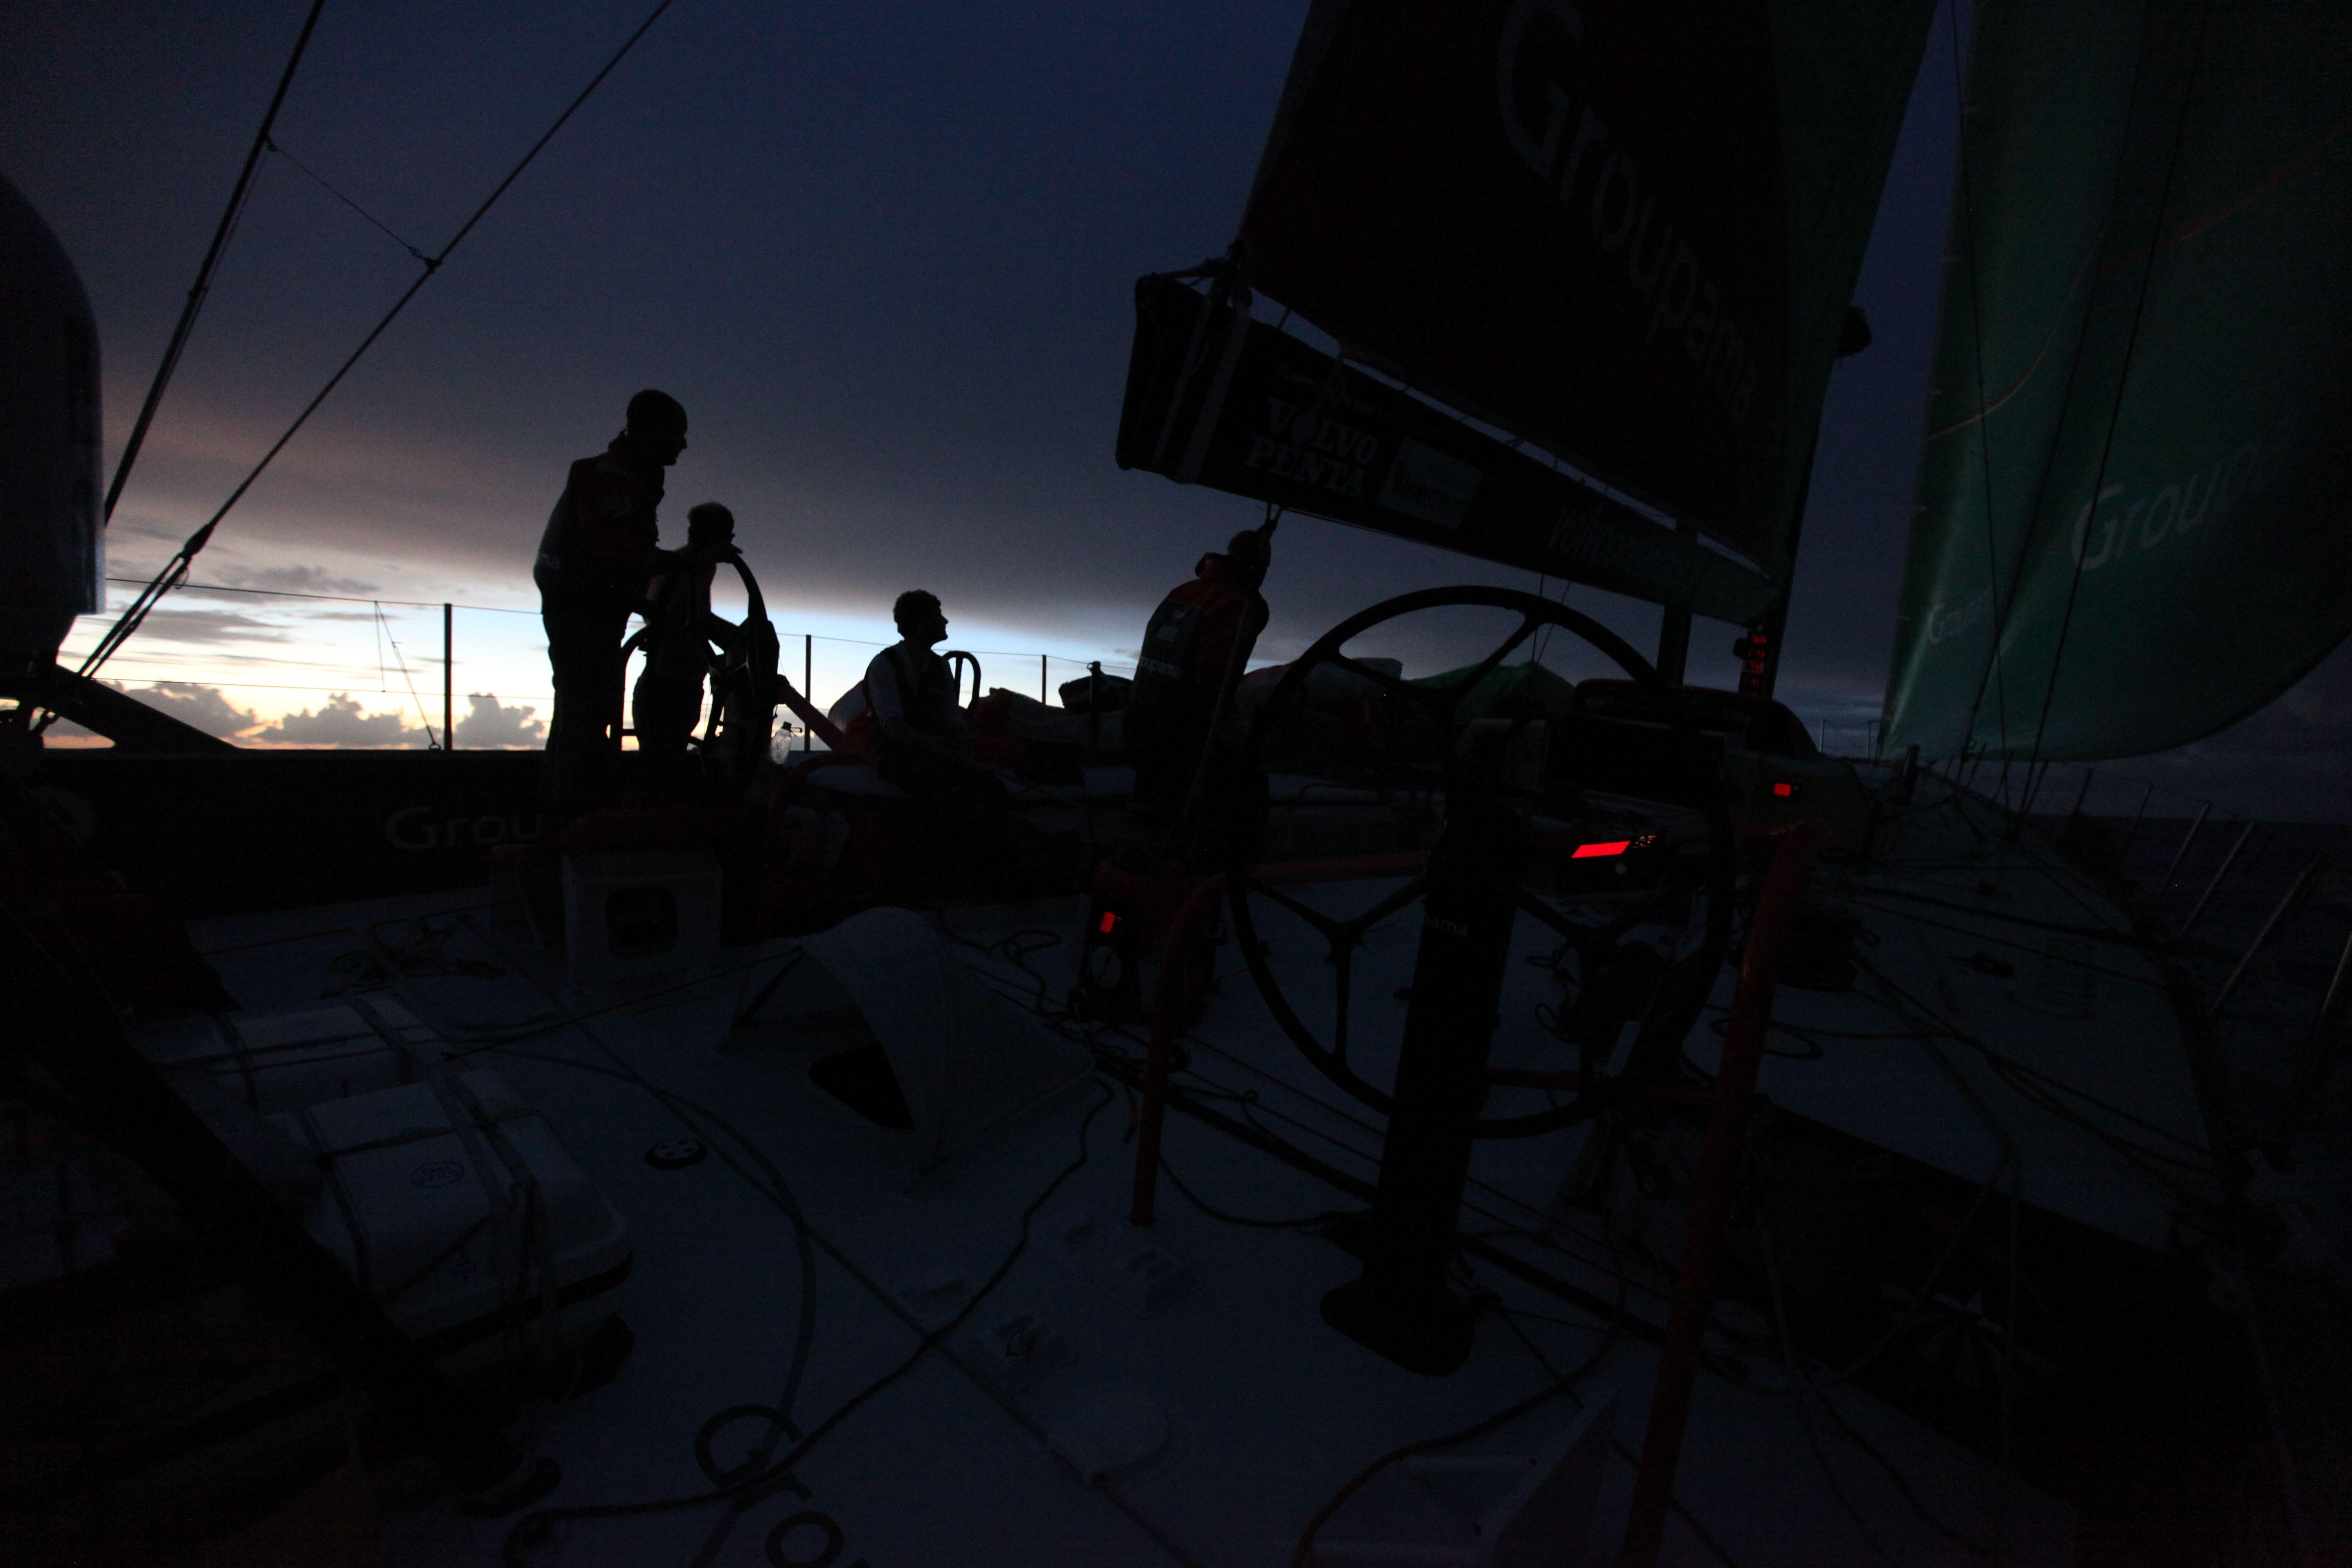 Leg 4 - Day 14 - Groupama in the Volvo Ocean Race